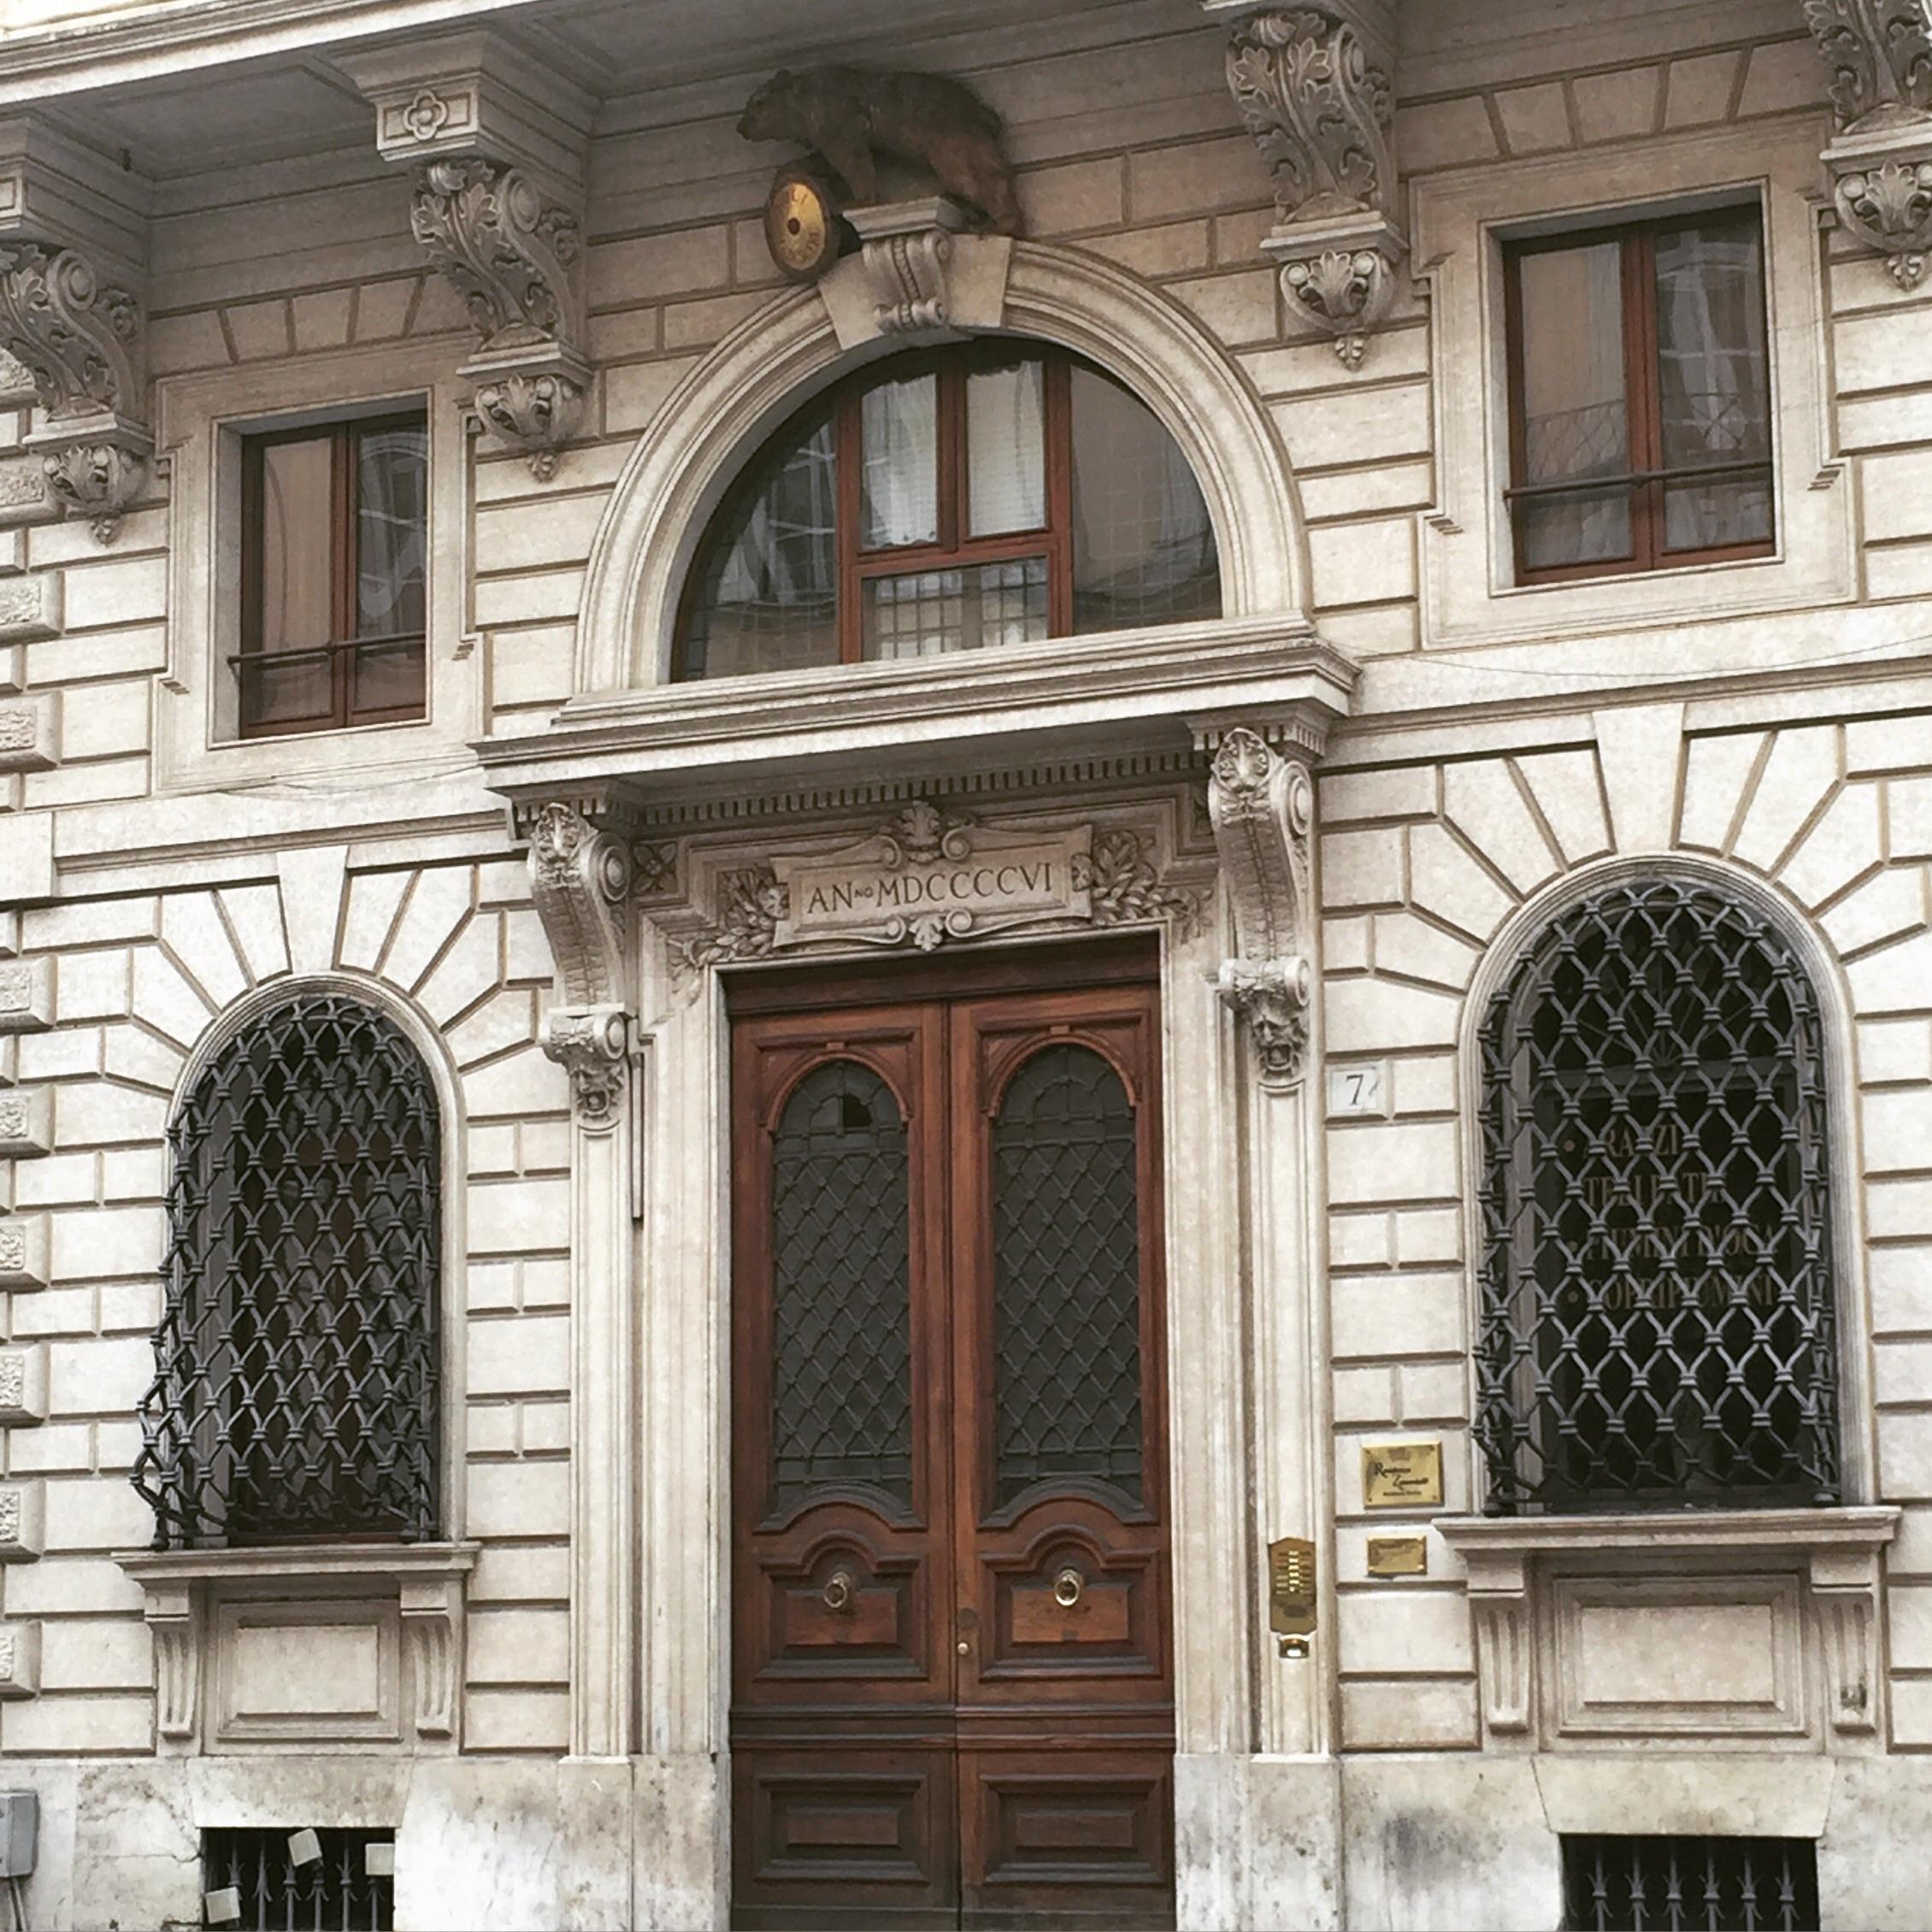 a stunning doorway